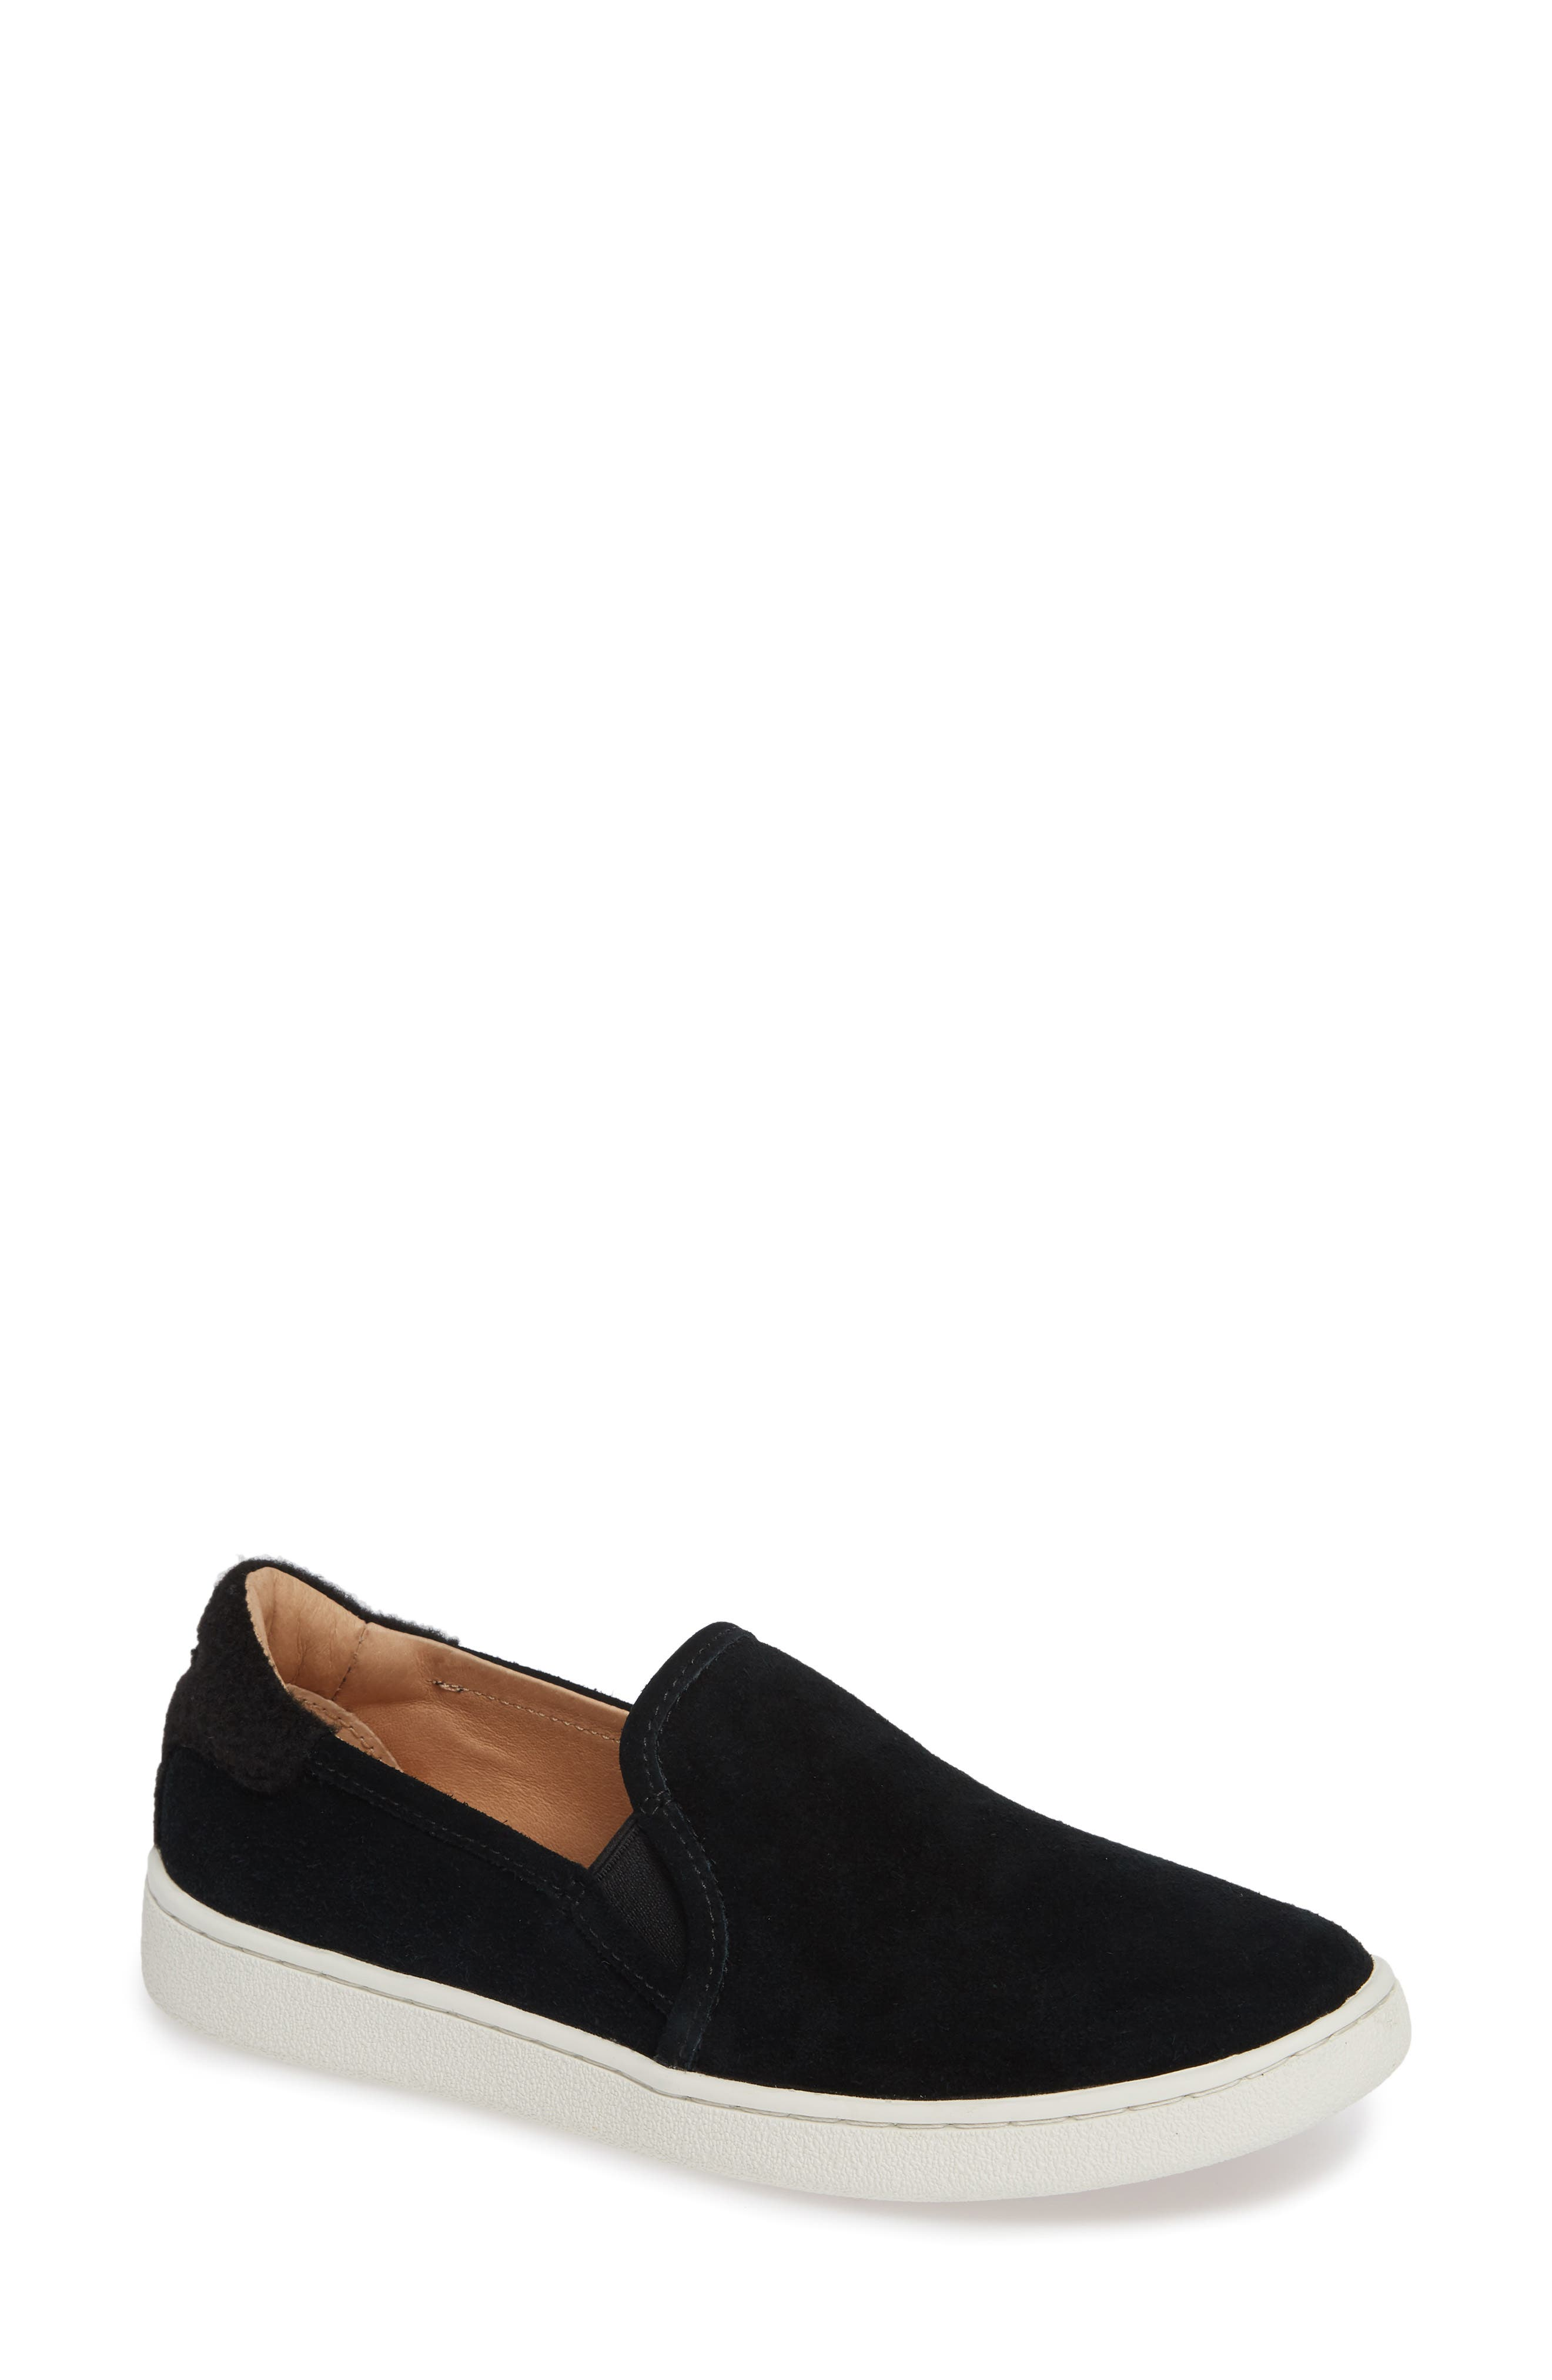 Cas Slip-On Sneaker,                         Main,                         color, BLACK